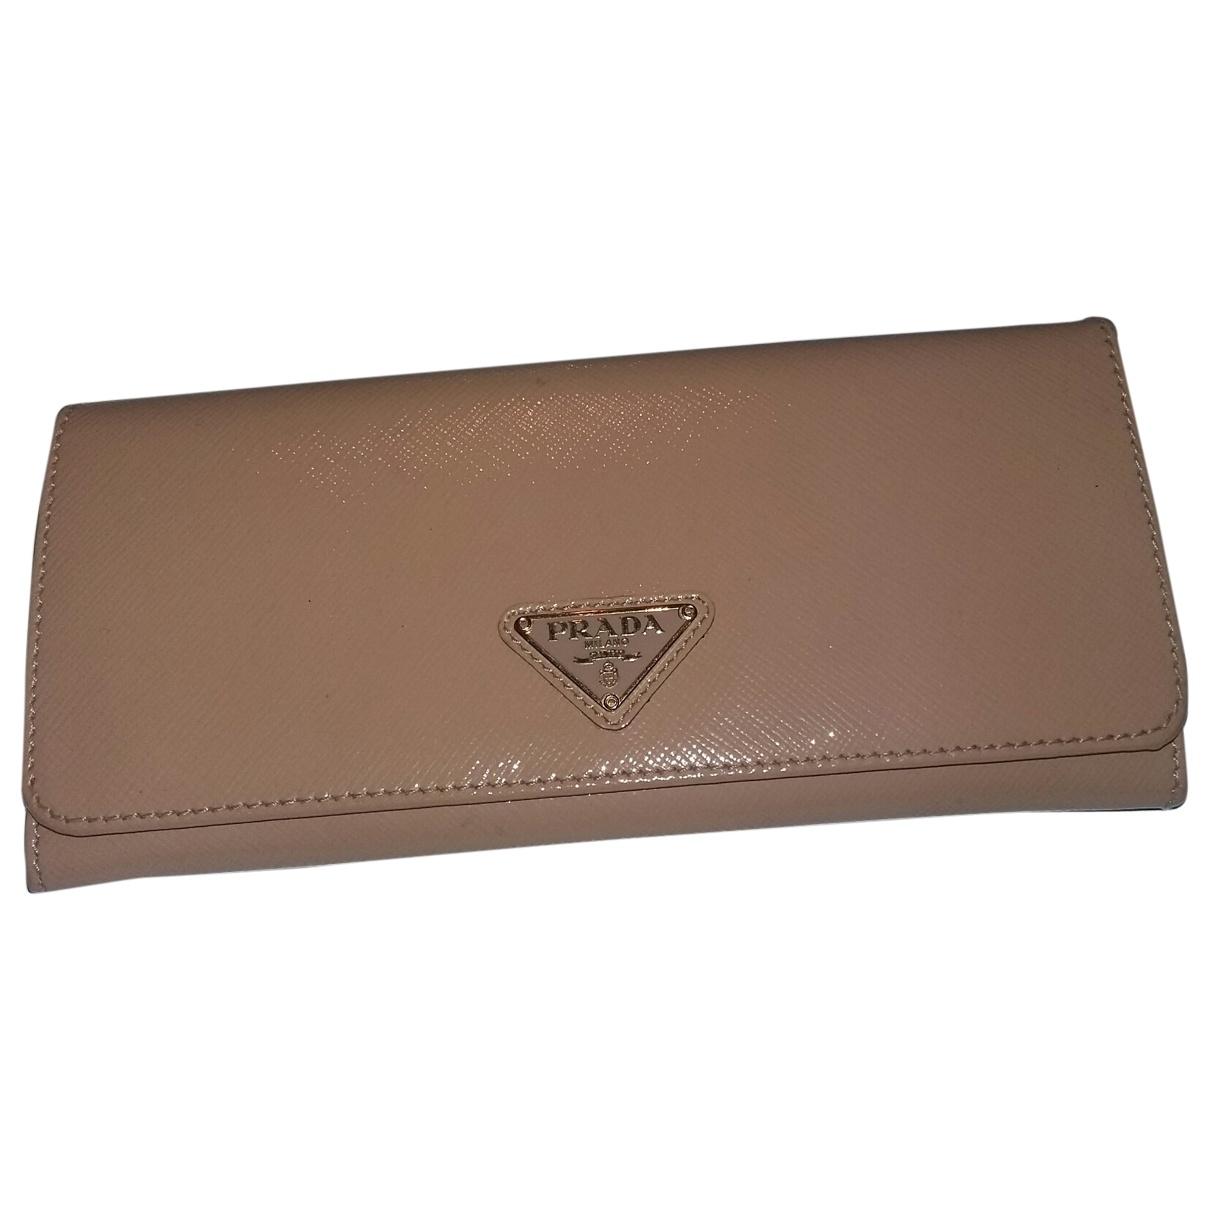 Prada - Portefeuille   pour femme en cuir verni - rose